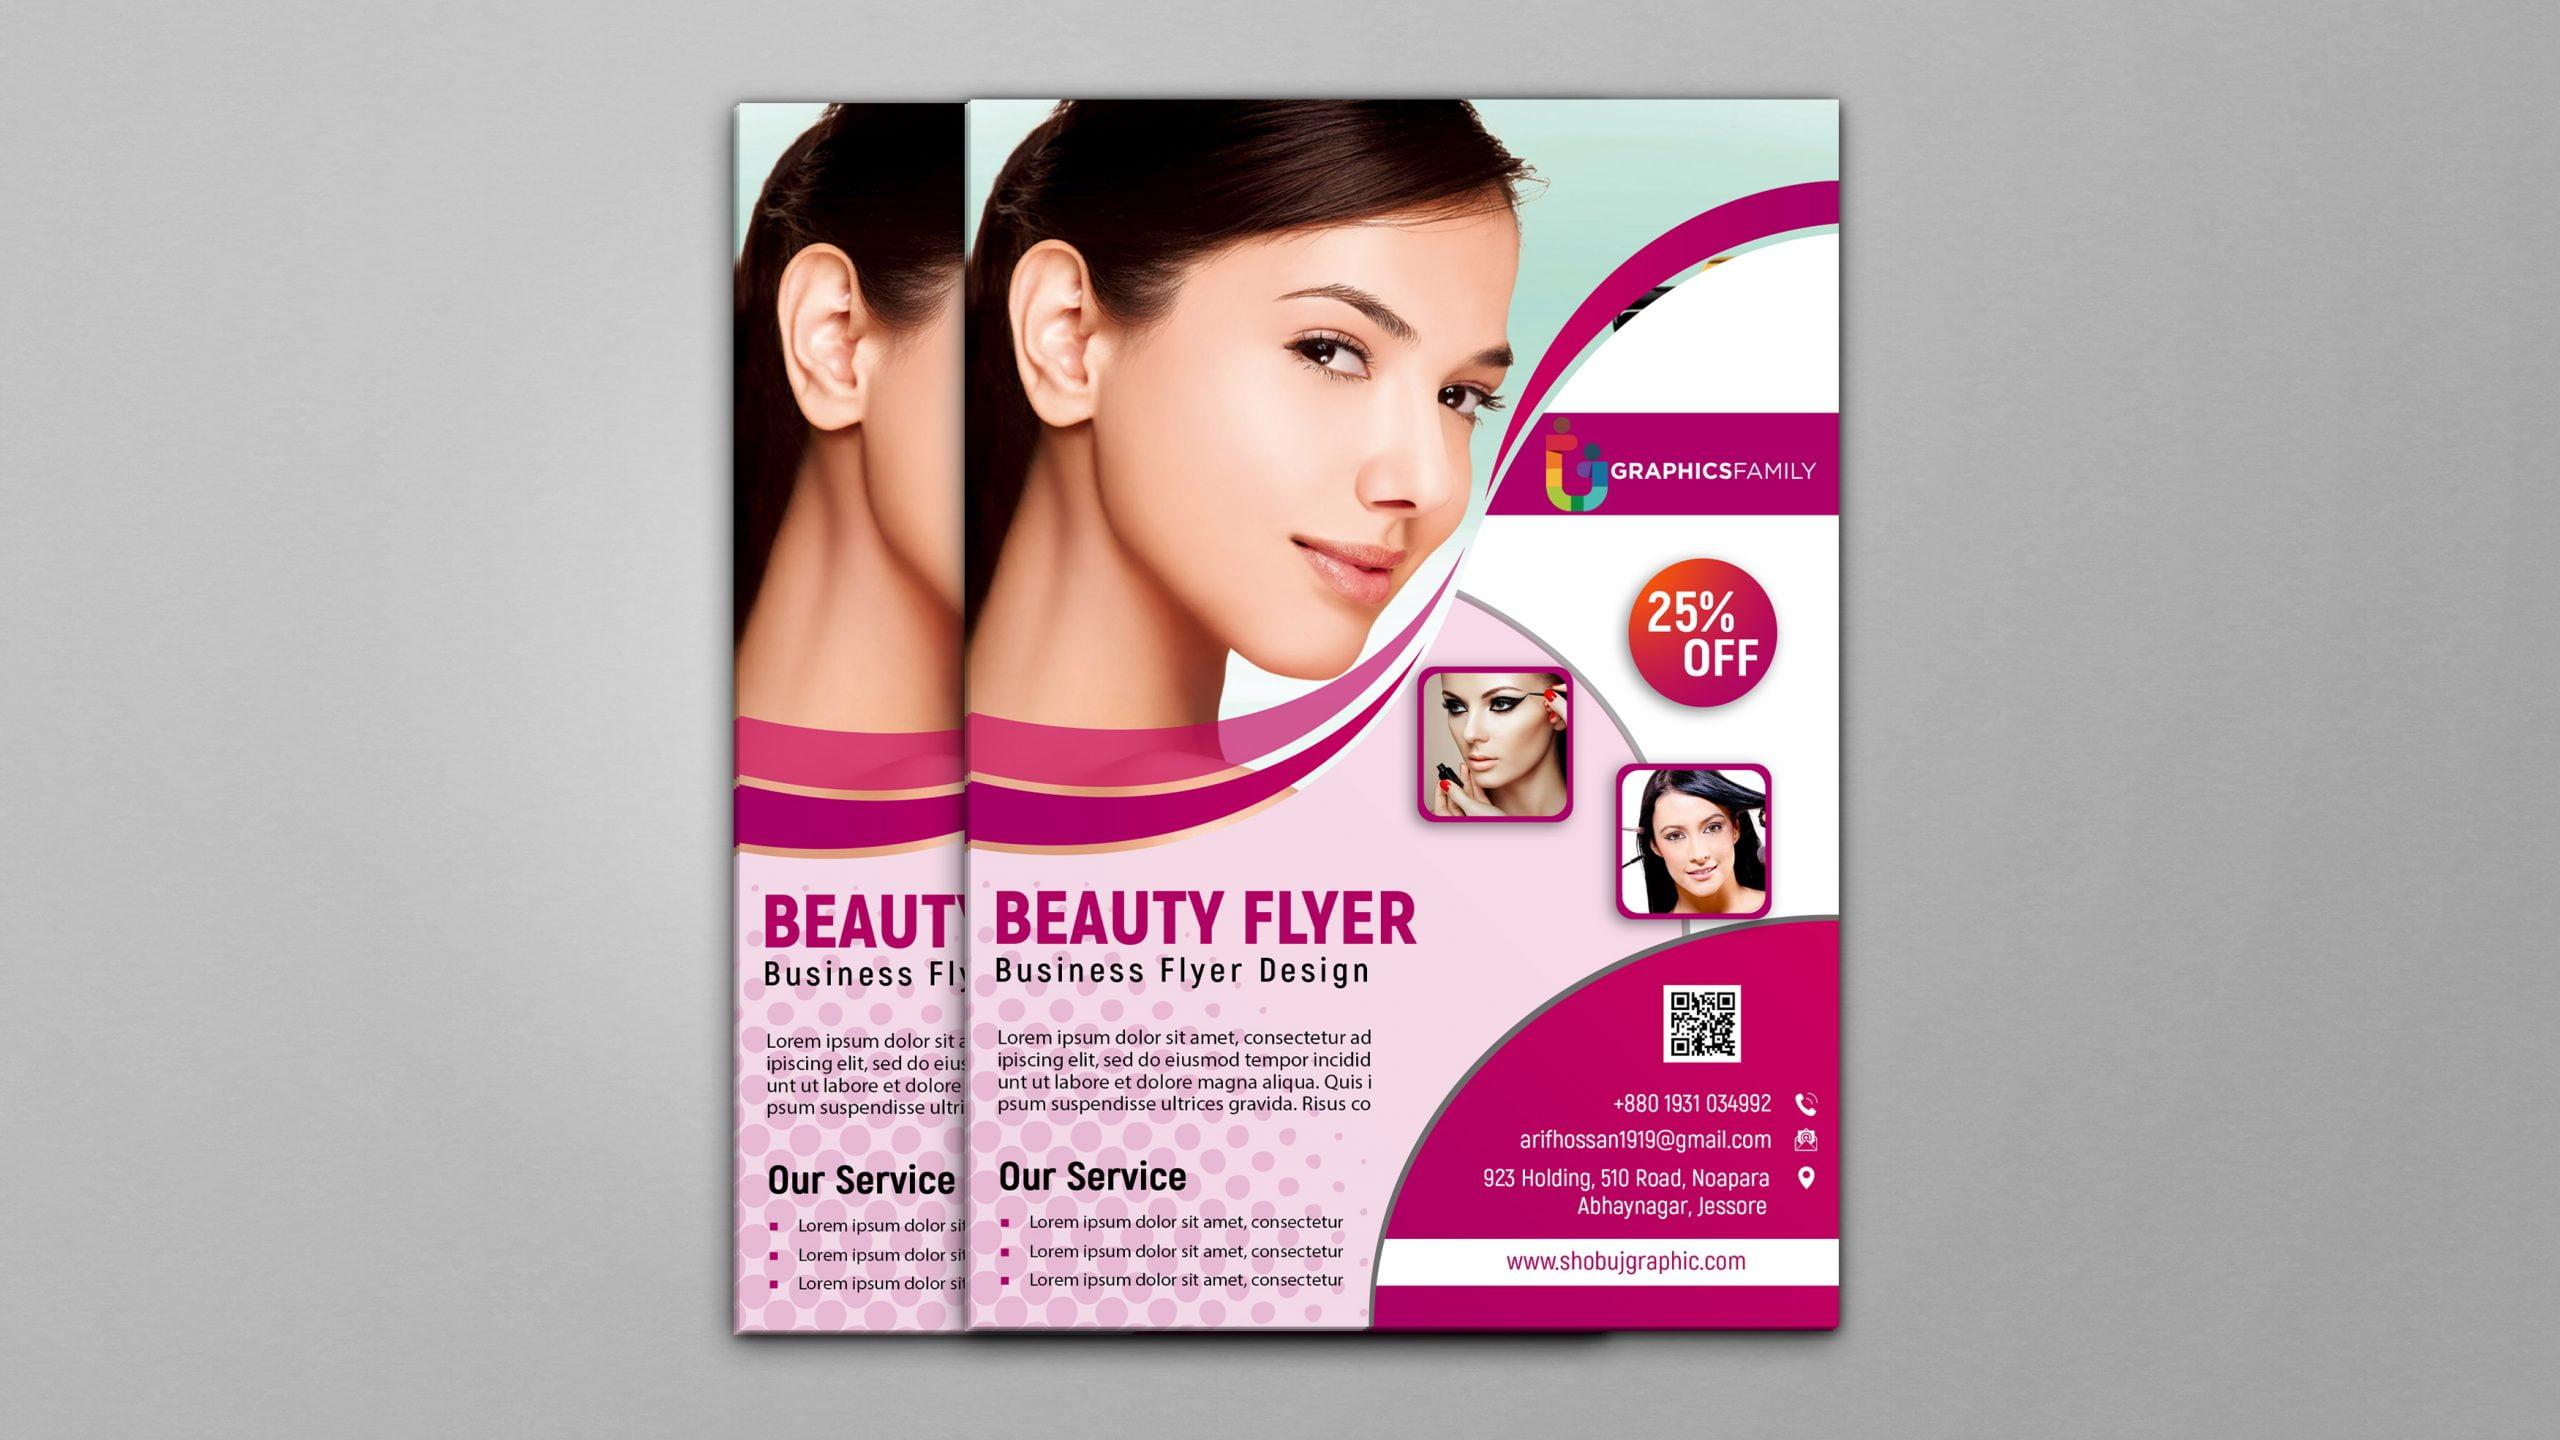 Free Beauty Flyer Photoshop Template psd